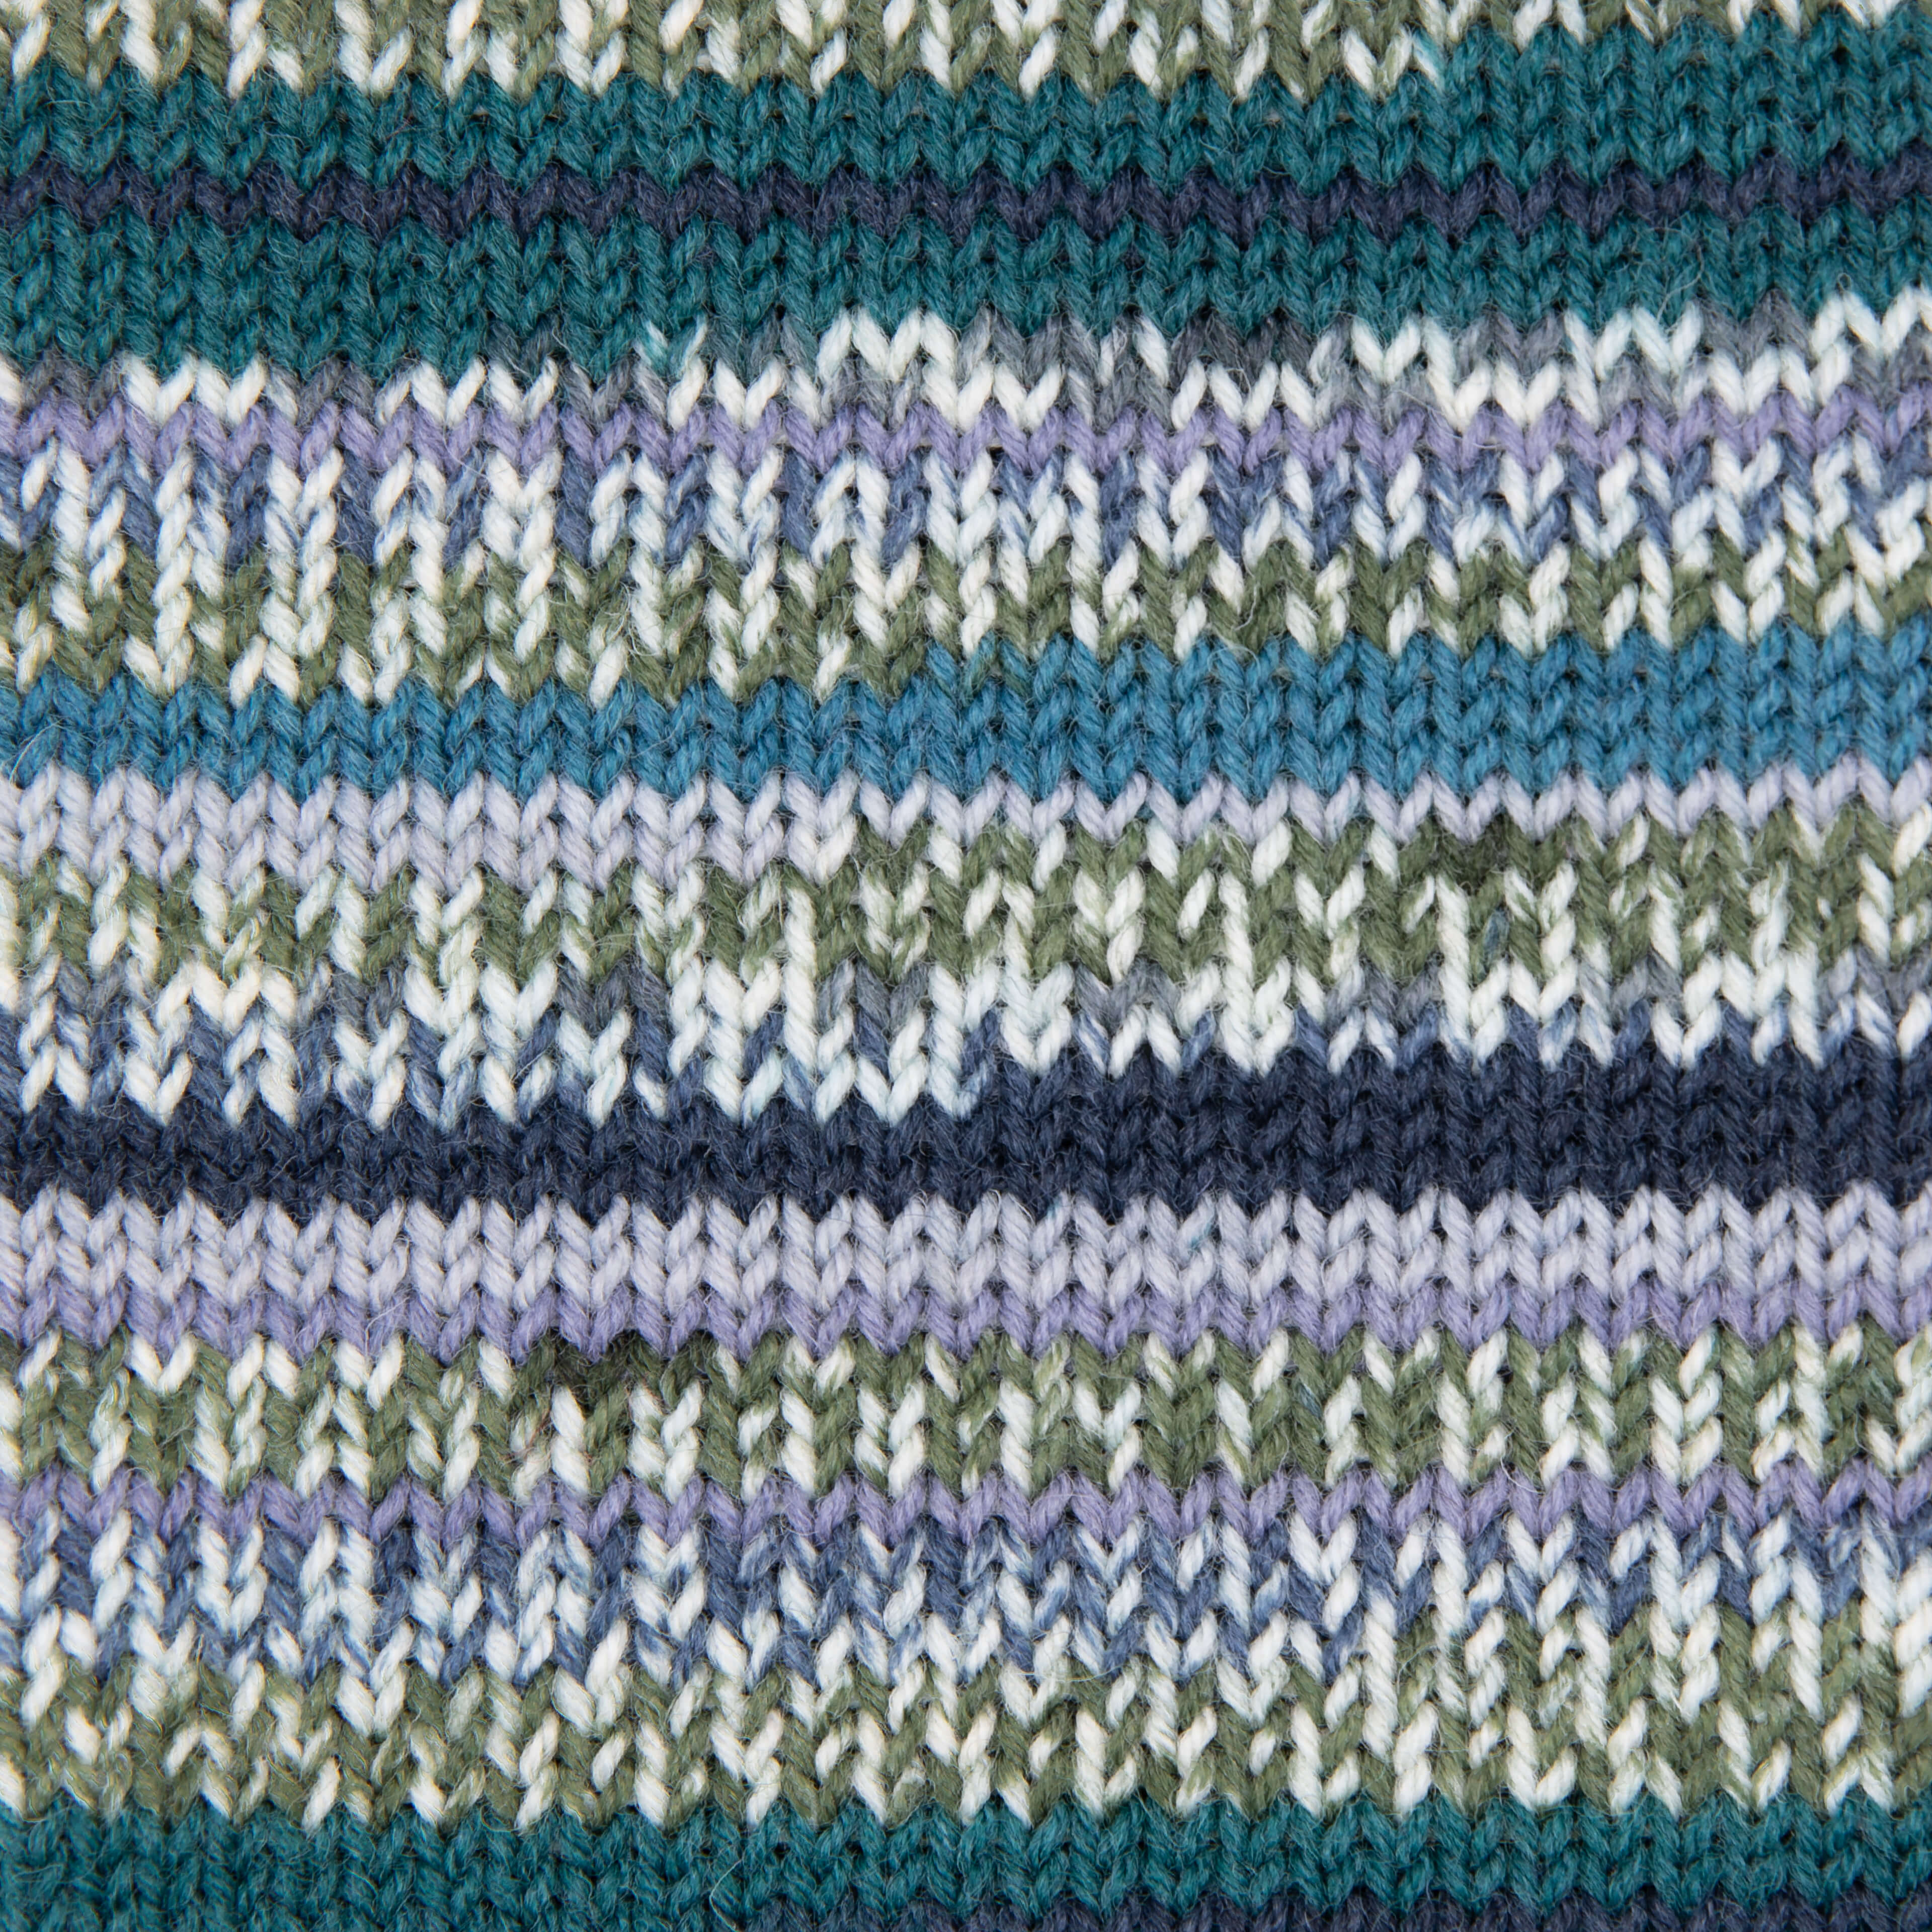 dunkelblau-grün-grau-multicolor